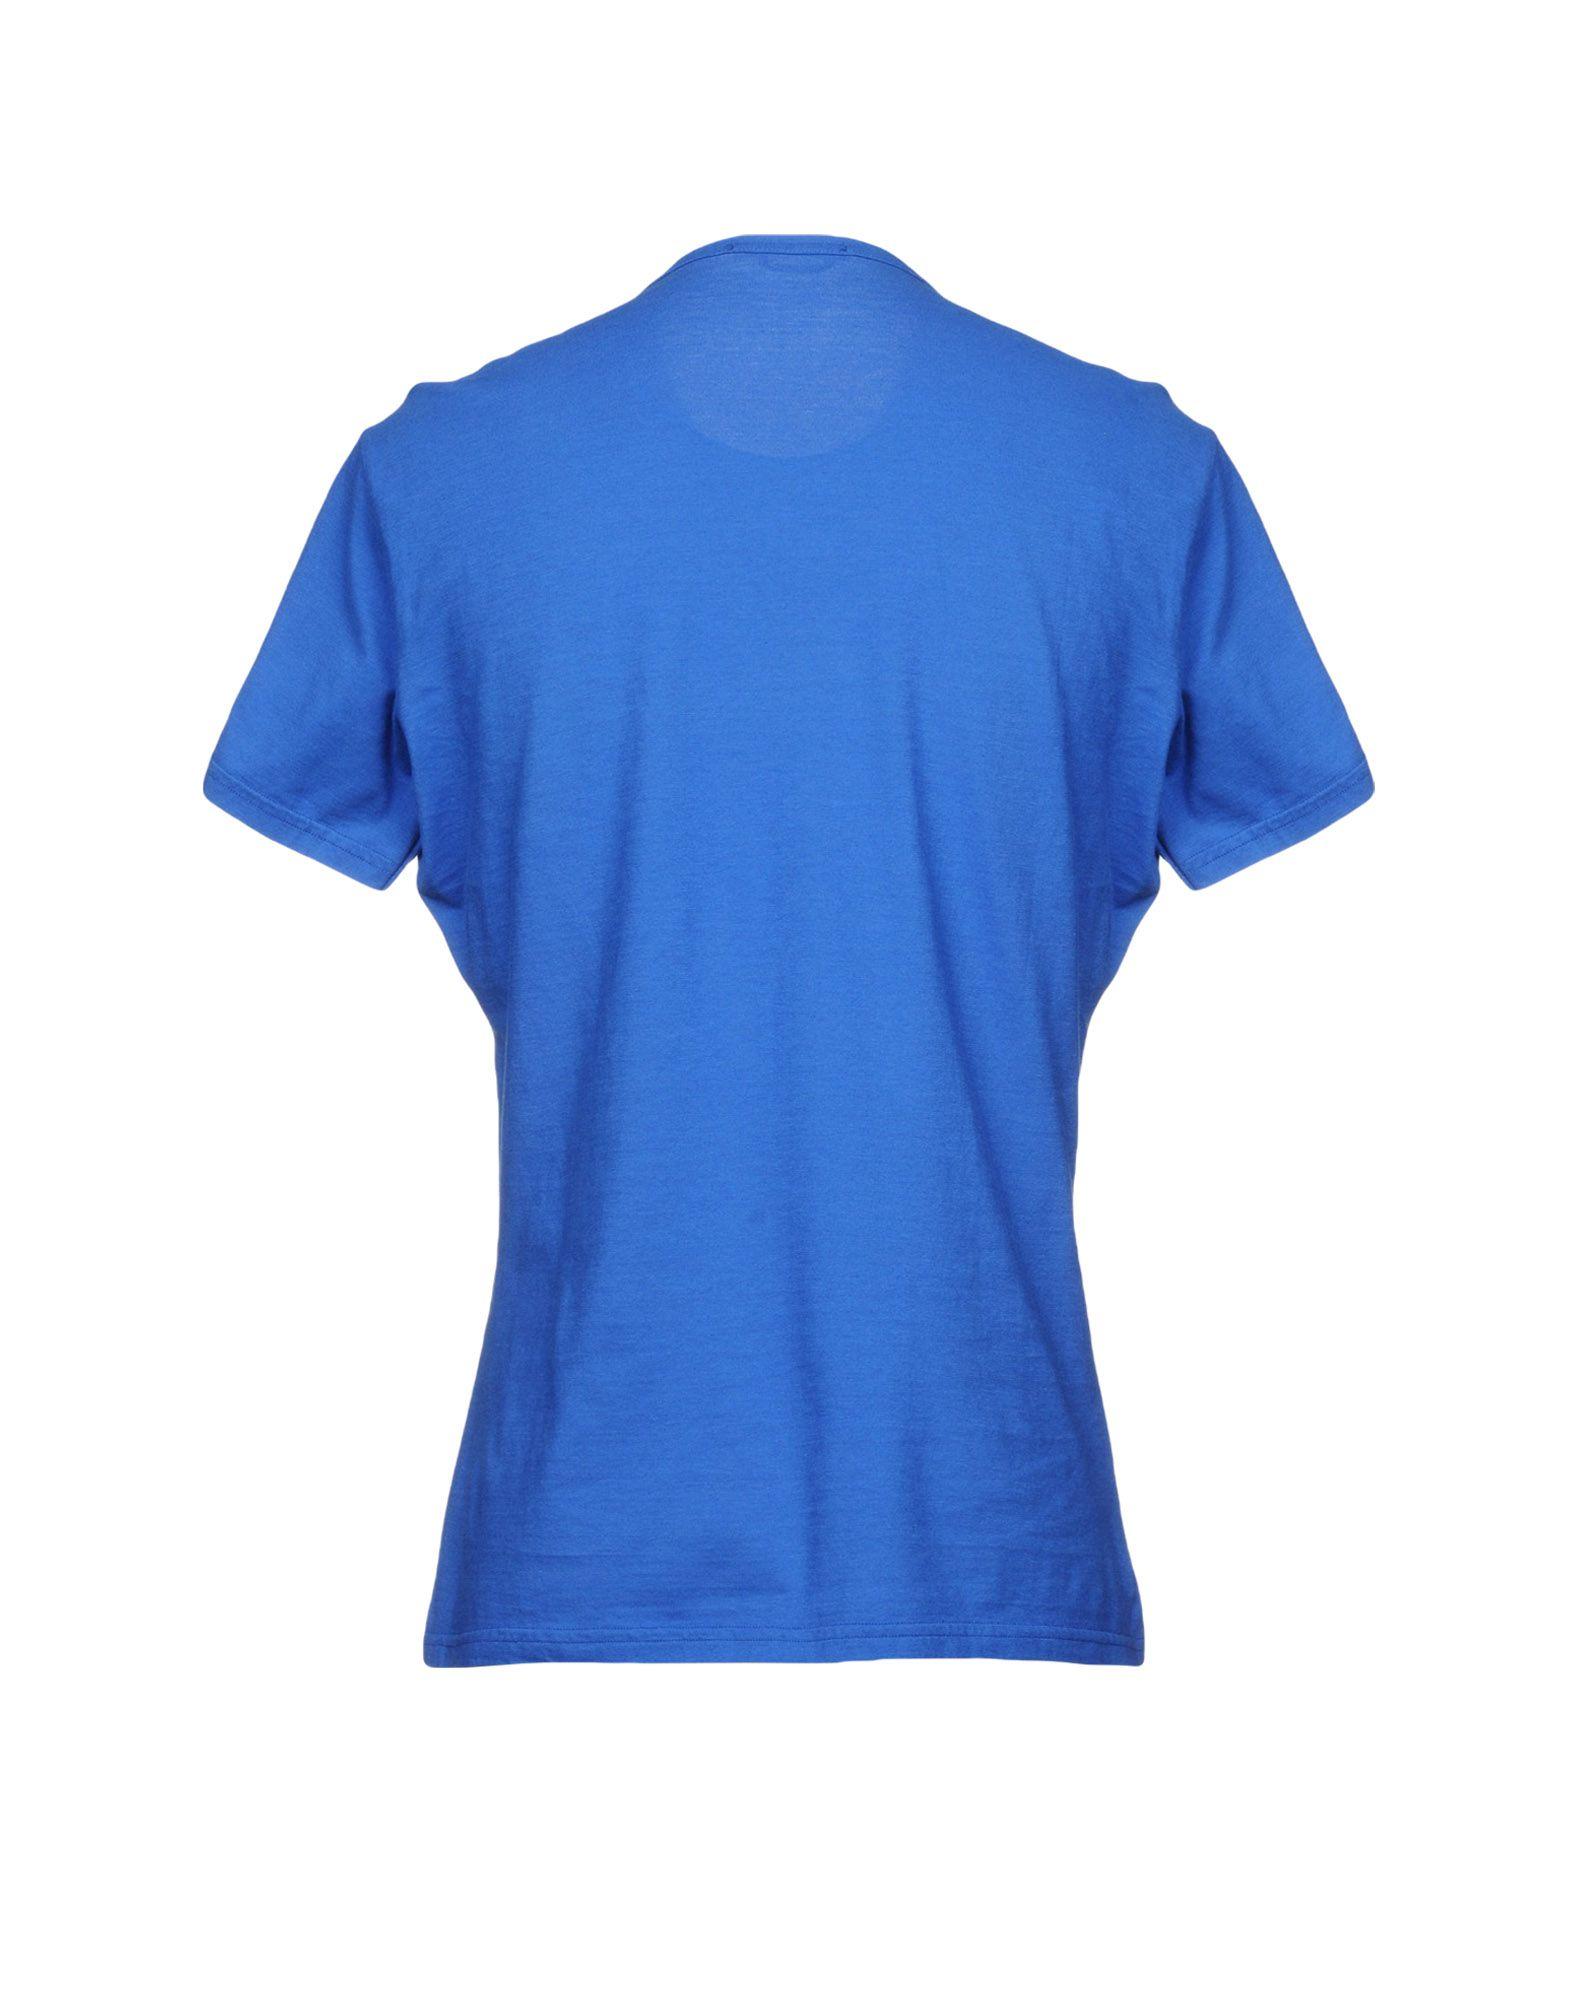 T-Shirt Alessandrini Daniele Alessandrini T-Shirt Uomo - 12141056FS f1422f